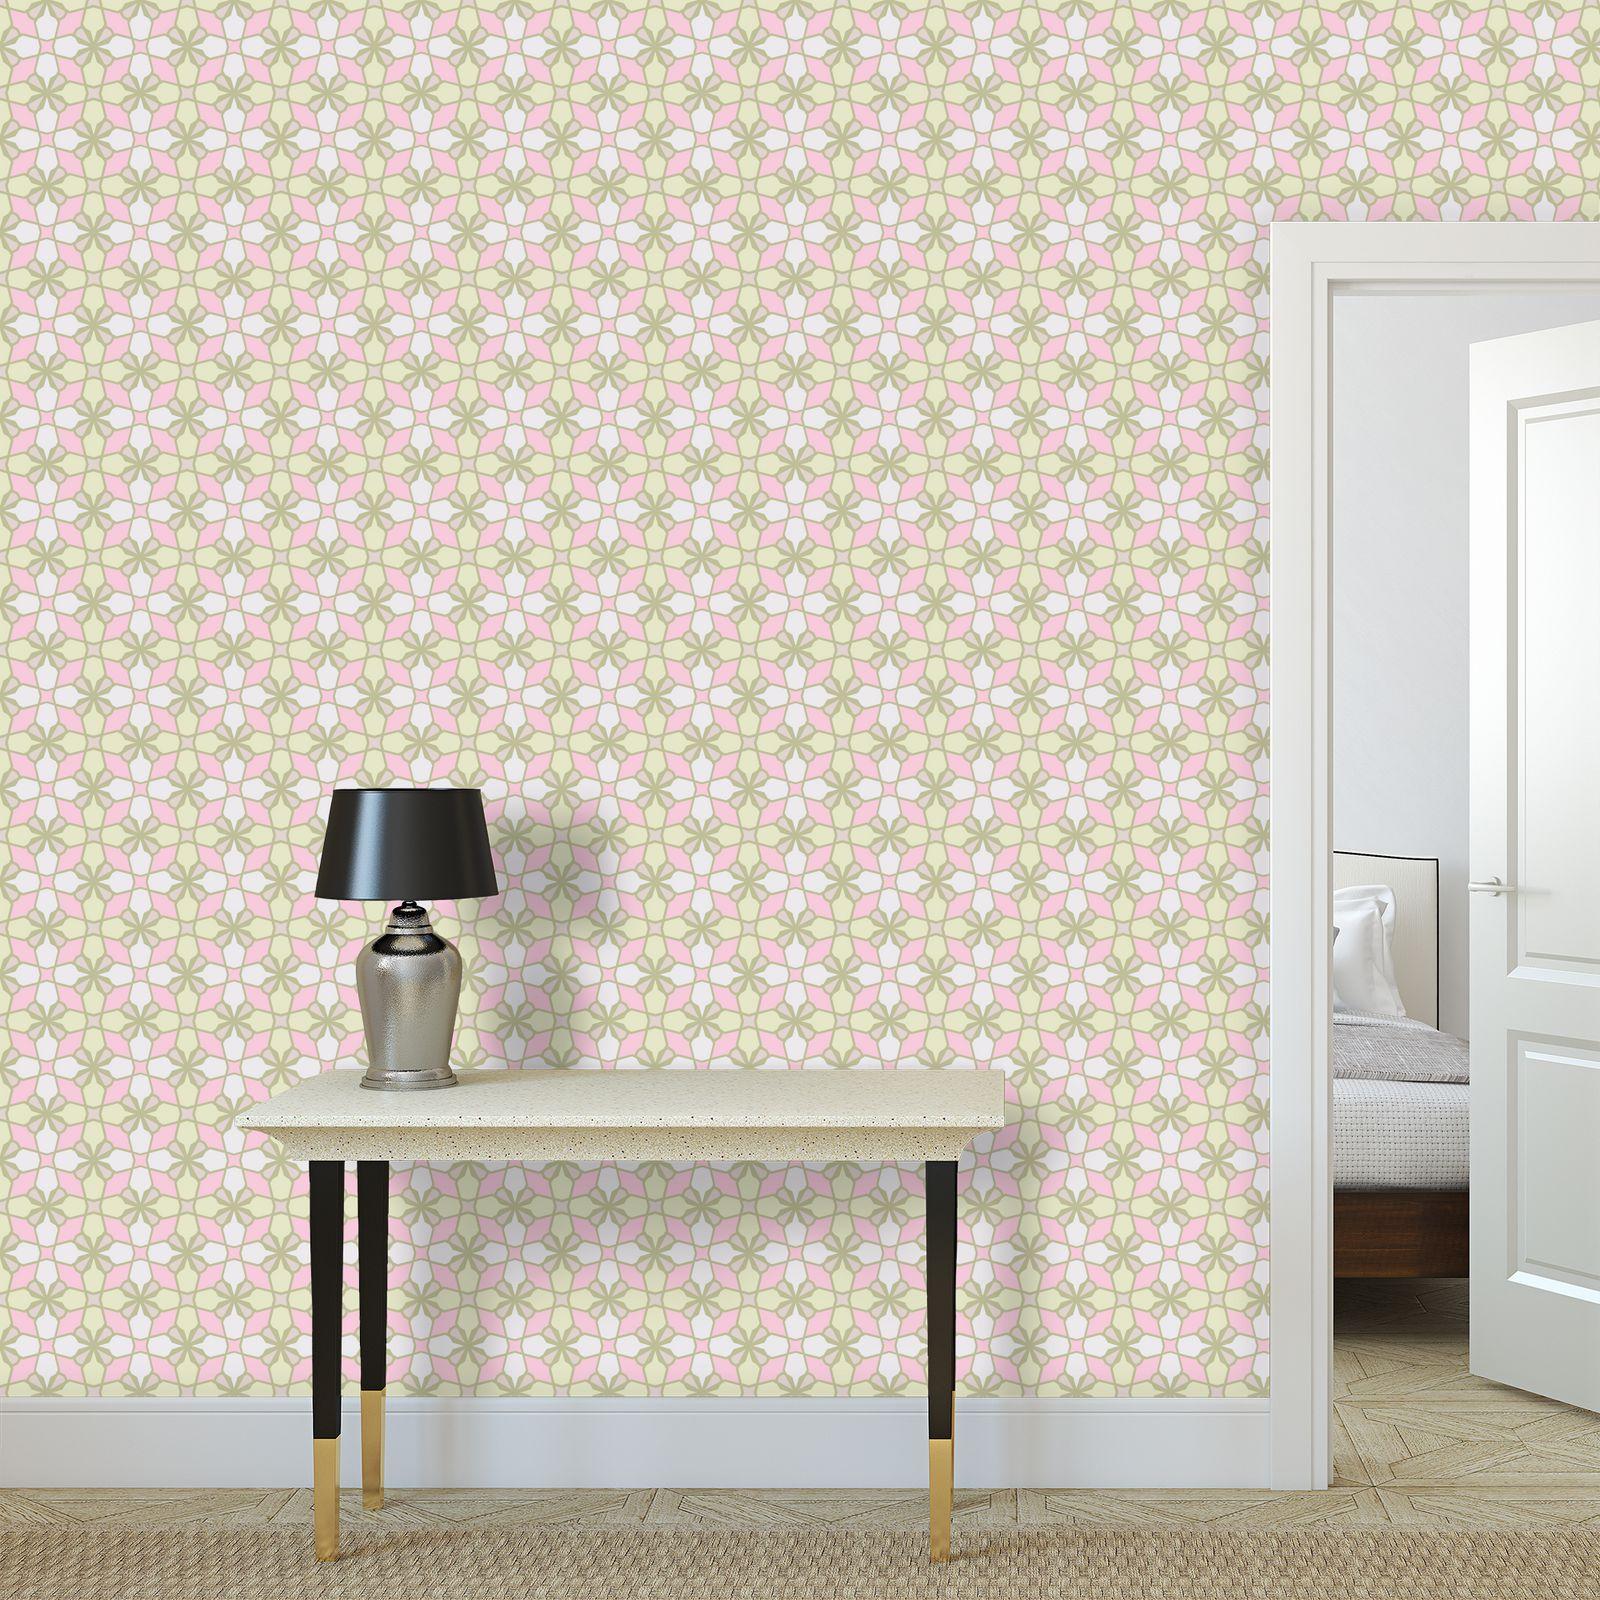 Wallpaper Rolls Shapes 4